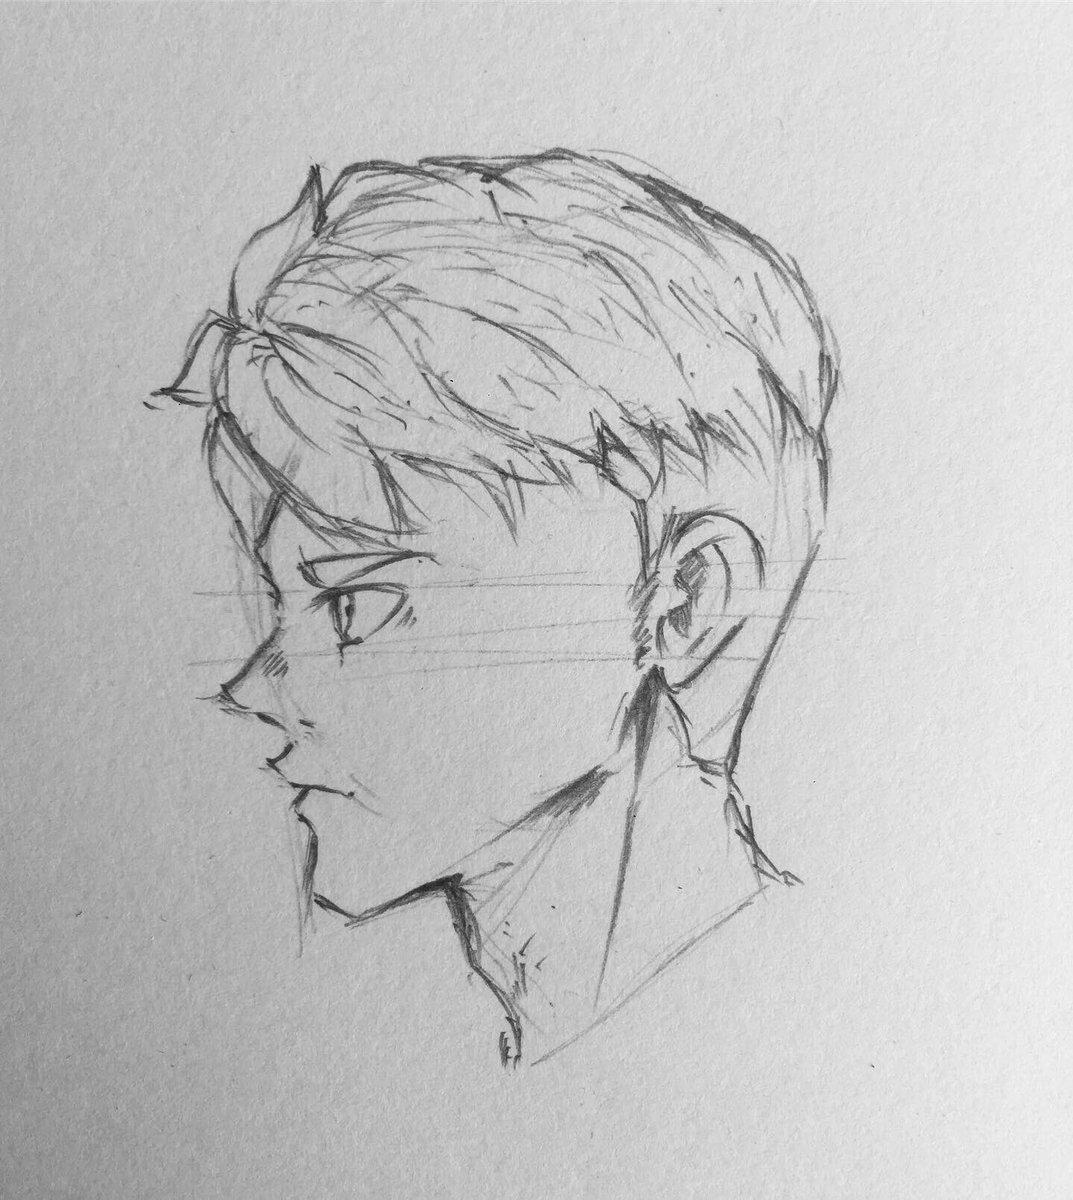 ꧁Sketching ꧂ part 3  #anime #AnimeArt #art #artist #ArtistOnTwitter #artshare #artwork #drawing #originalcharacter #fanart #sketches #sketchbook #sketch #manga #mangaart #mangak